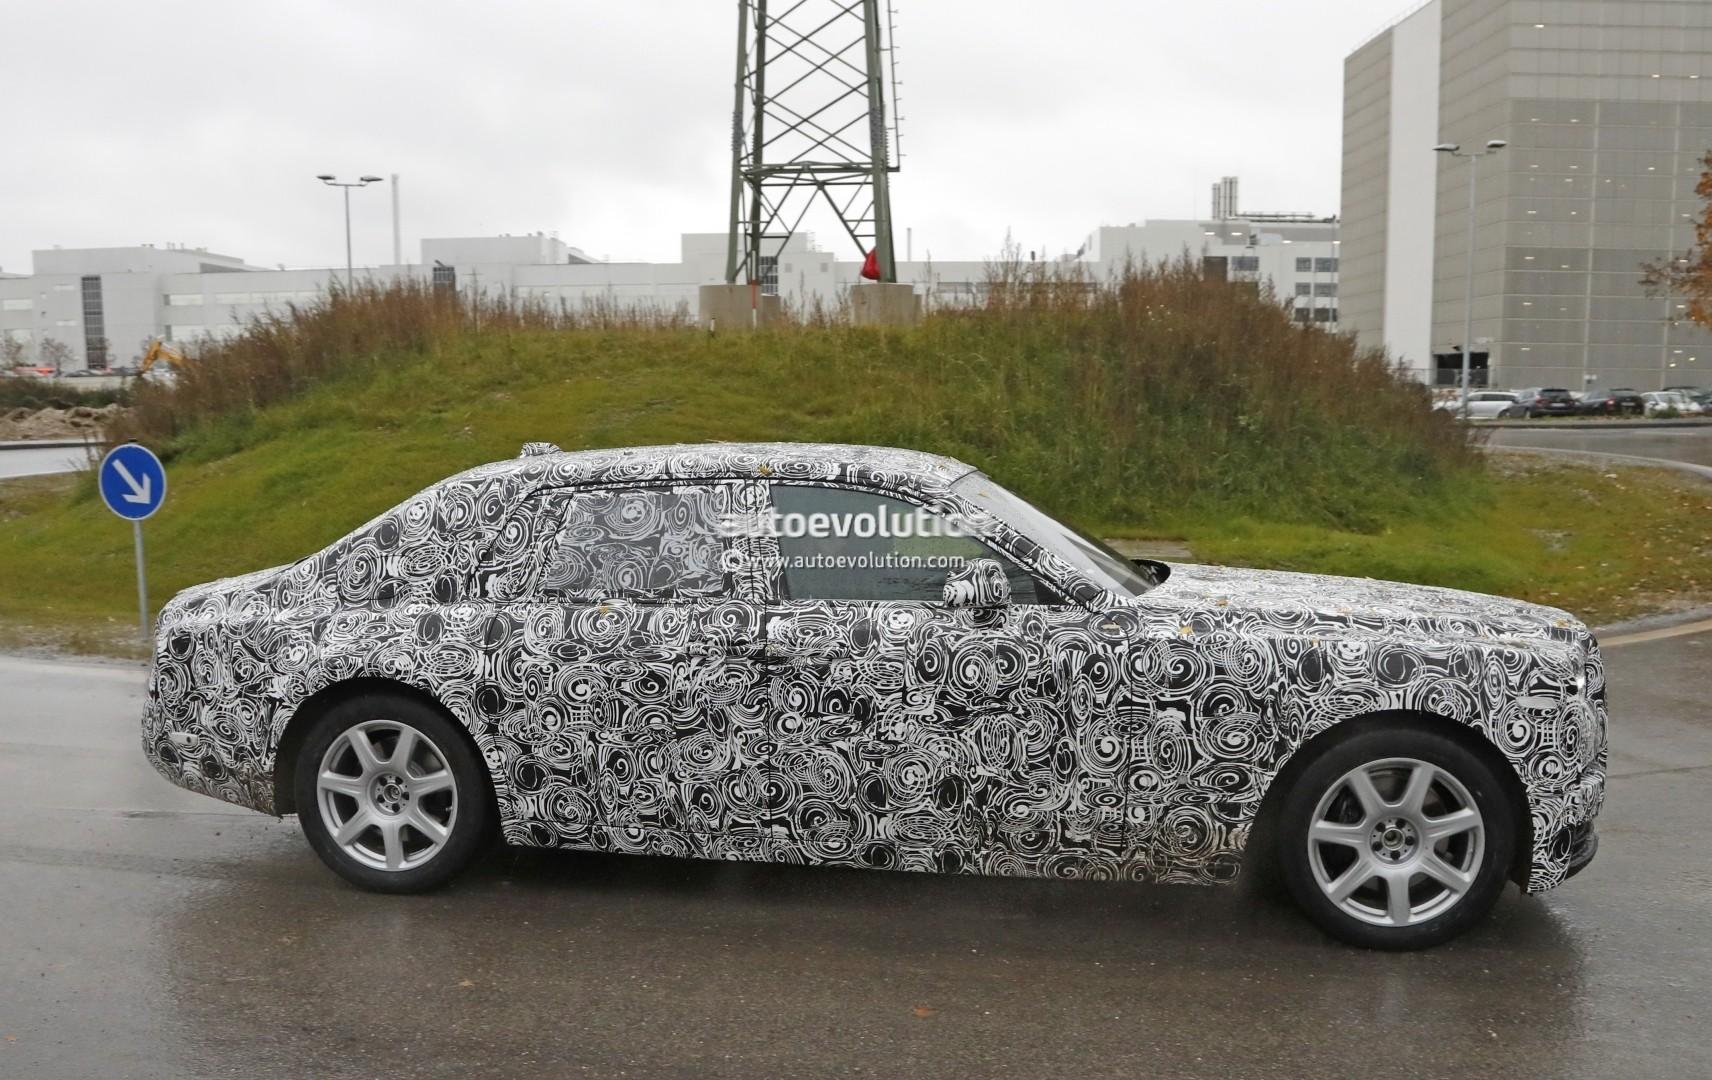 2017 - [Rolls Royce] Phantom - Page 2 2018-rolls-royce-phantom-prototype-partially-reveals-new-headlights-taillights_6